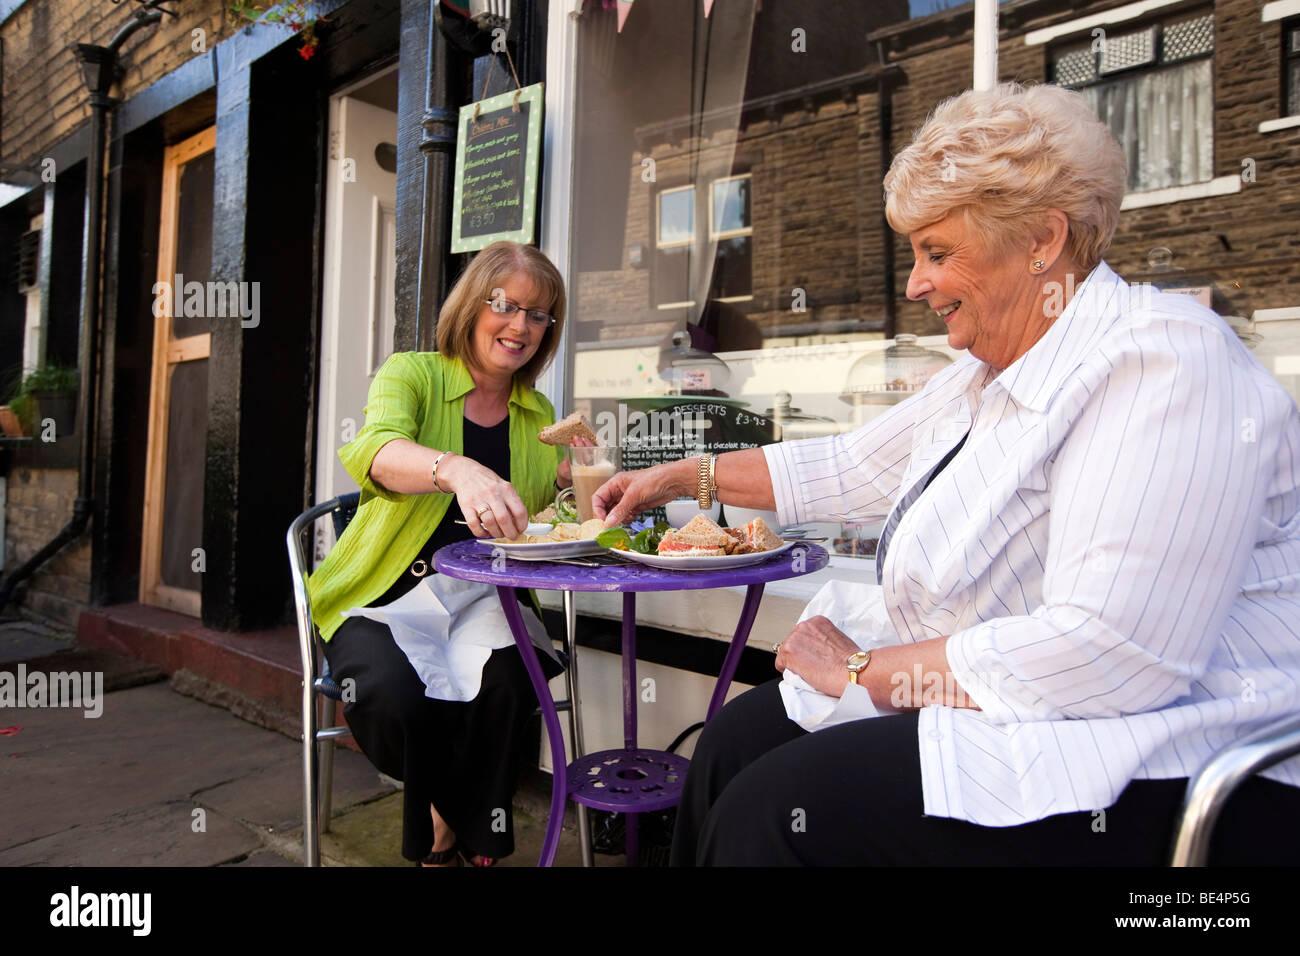 UK, England, Yorkshire, Haworth, Main Street, two women enjoying sandwich lunch outside in pavement cafe - Stock Image